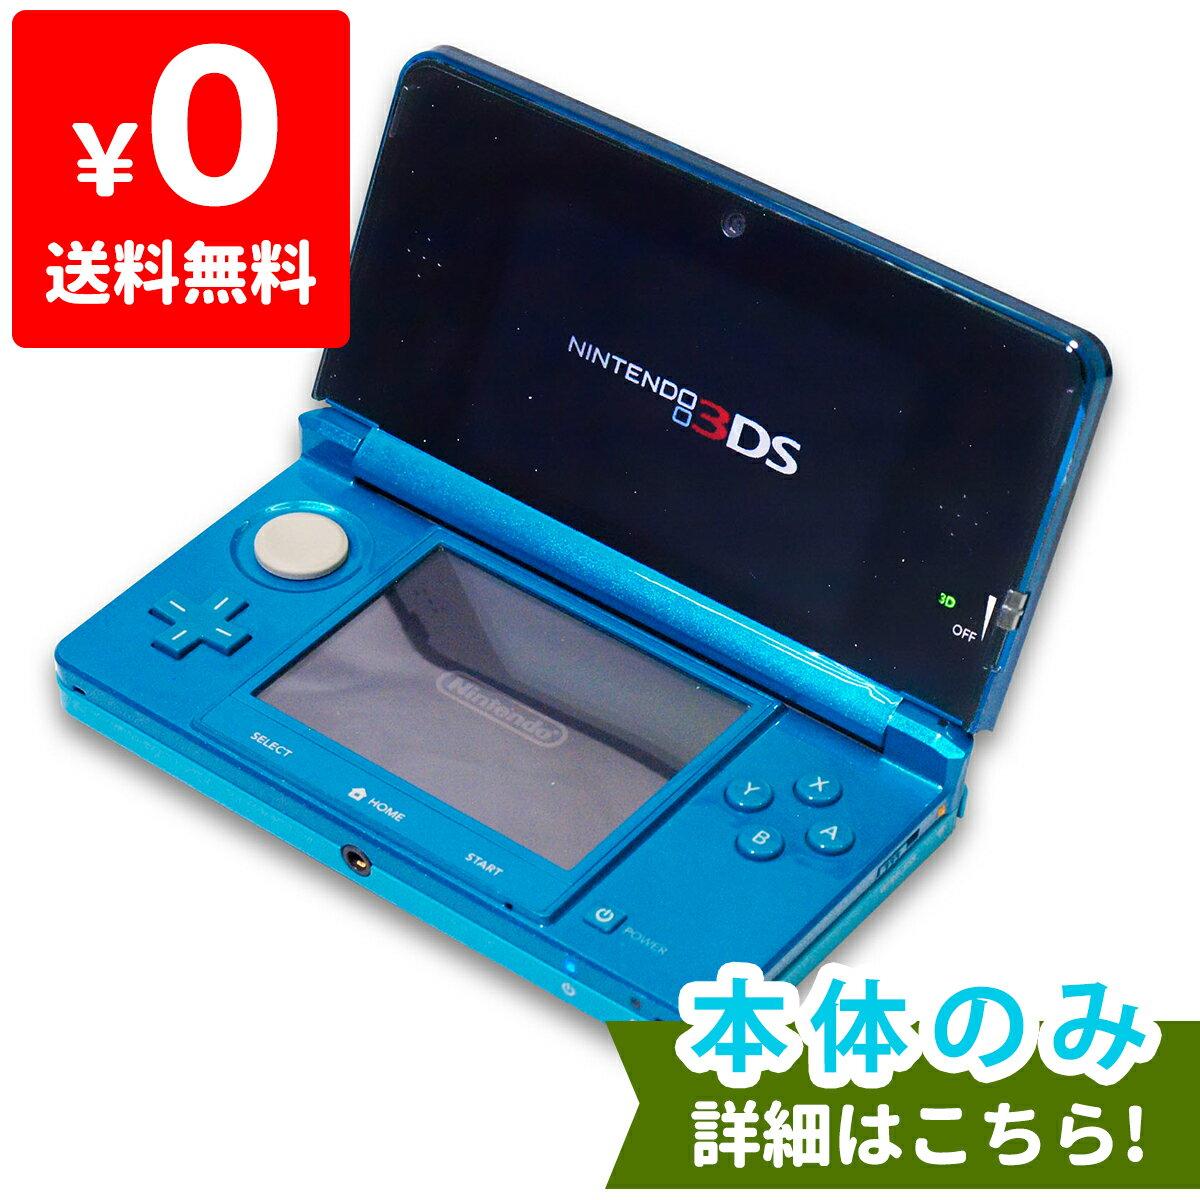 3DS 本体 アクアブルー メーカー生産終了 ニンテンドー 任天堂 NINTENDO ゲーム機 【中古】 4902370518764 送料無料